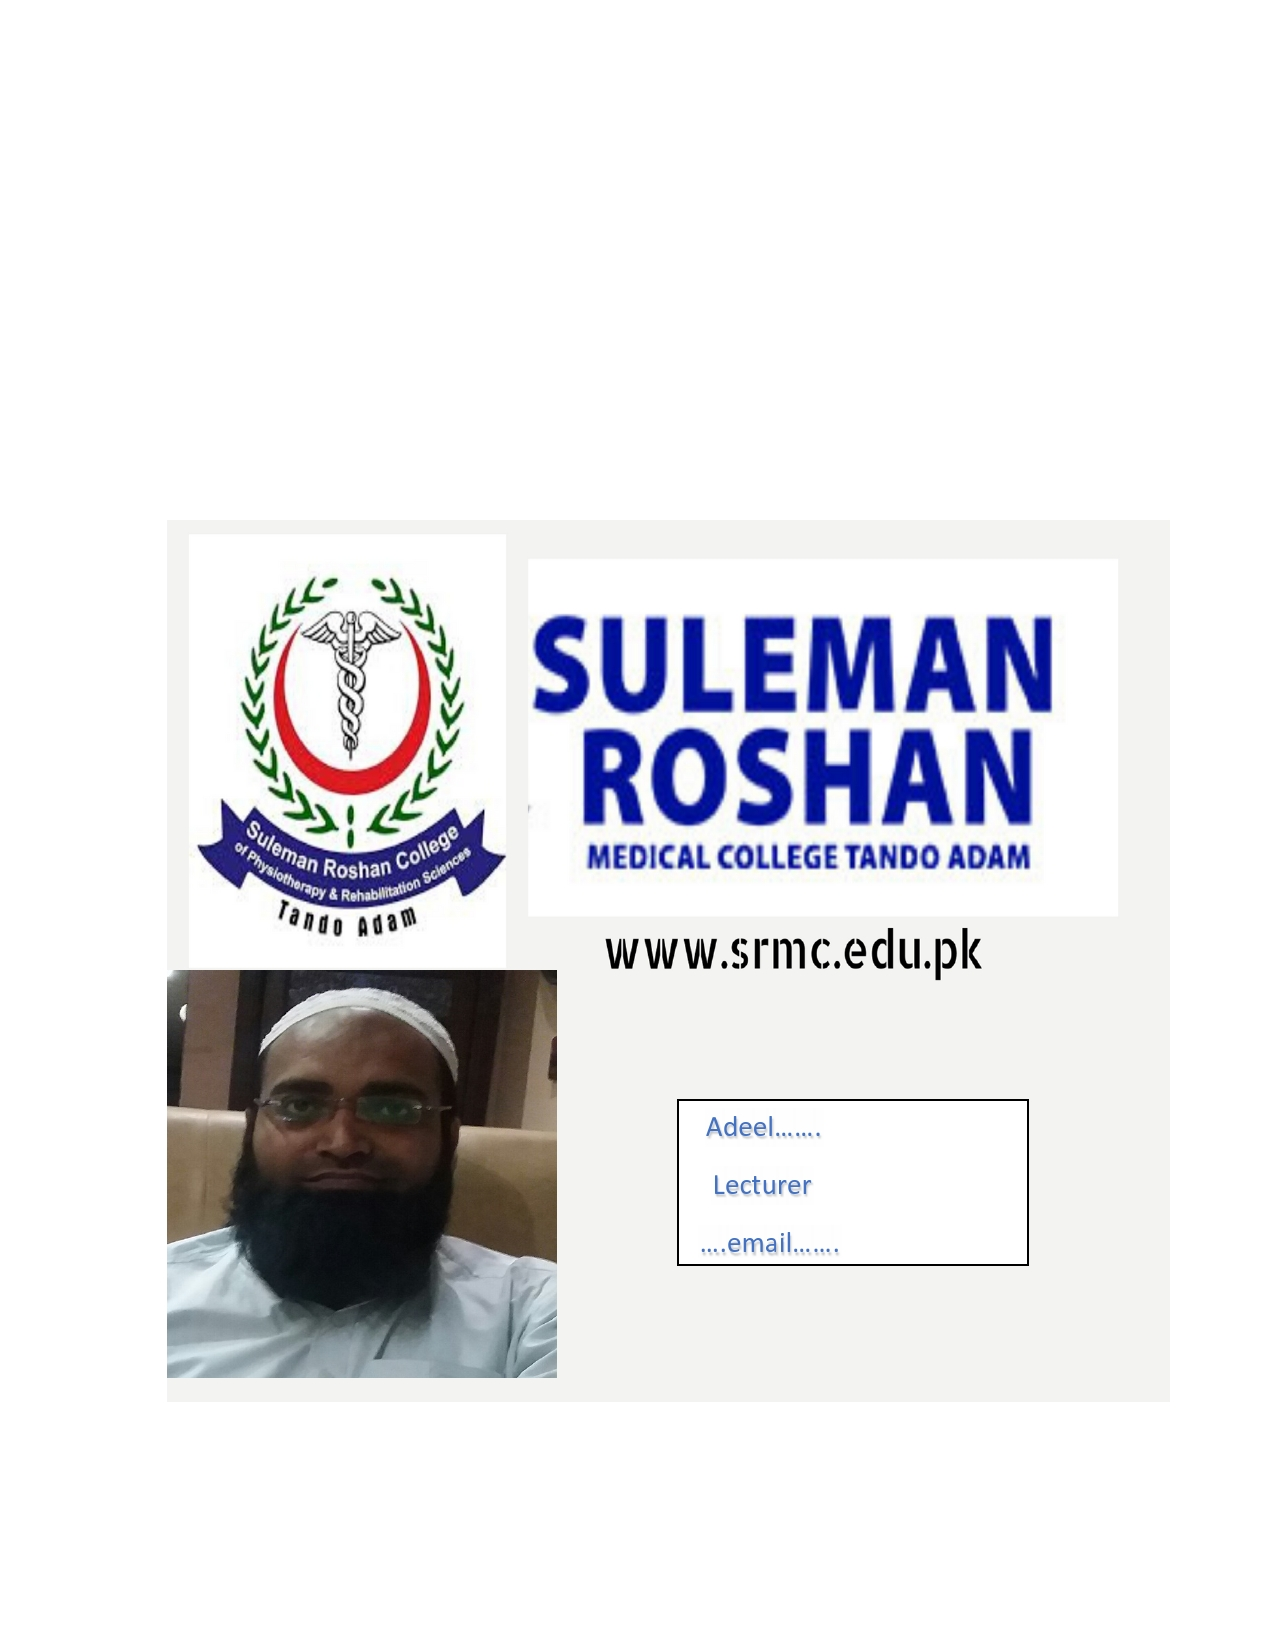 SULEMAN ROSHAN MEDICAL COLLEGE TANDO ADAM by Adeel khaskheli